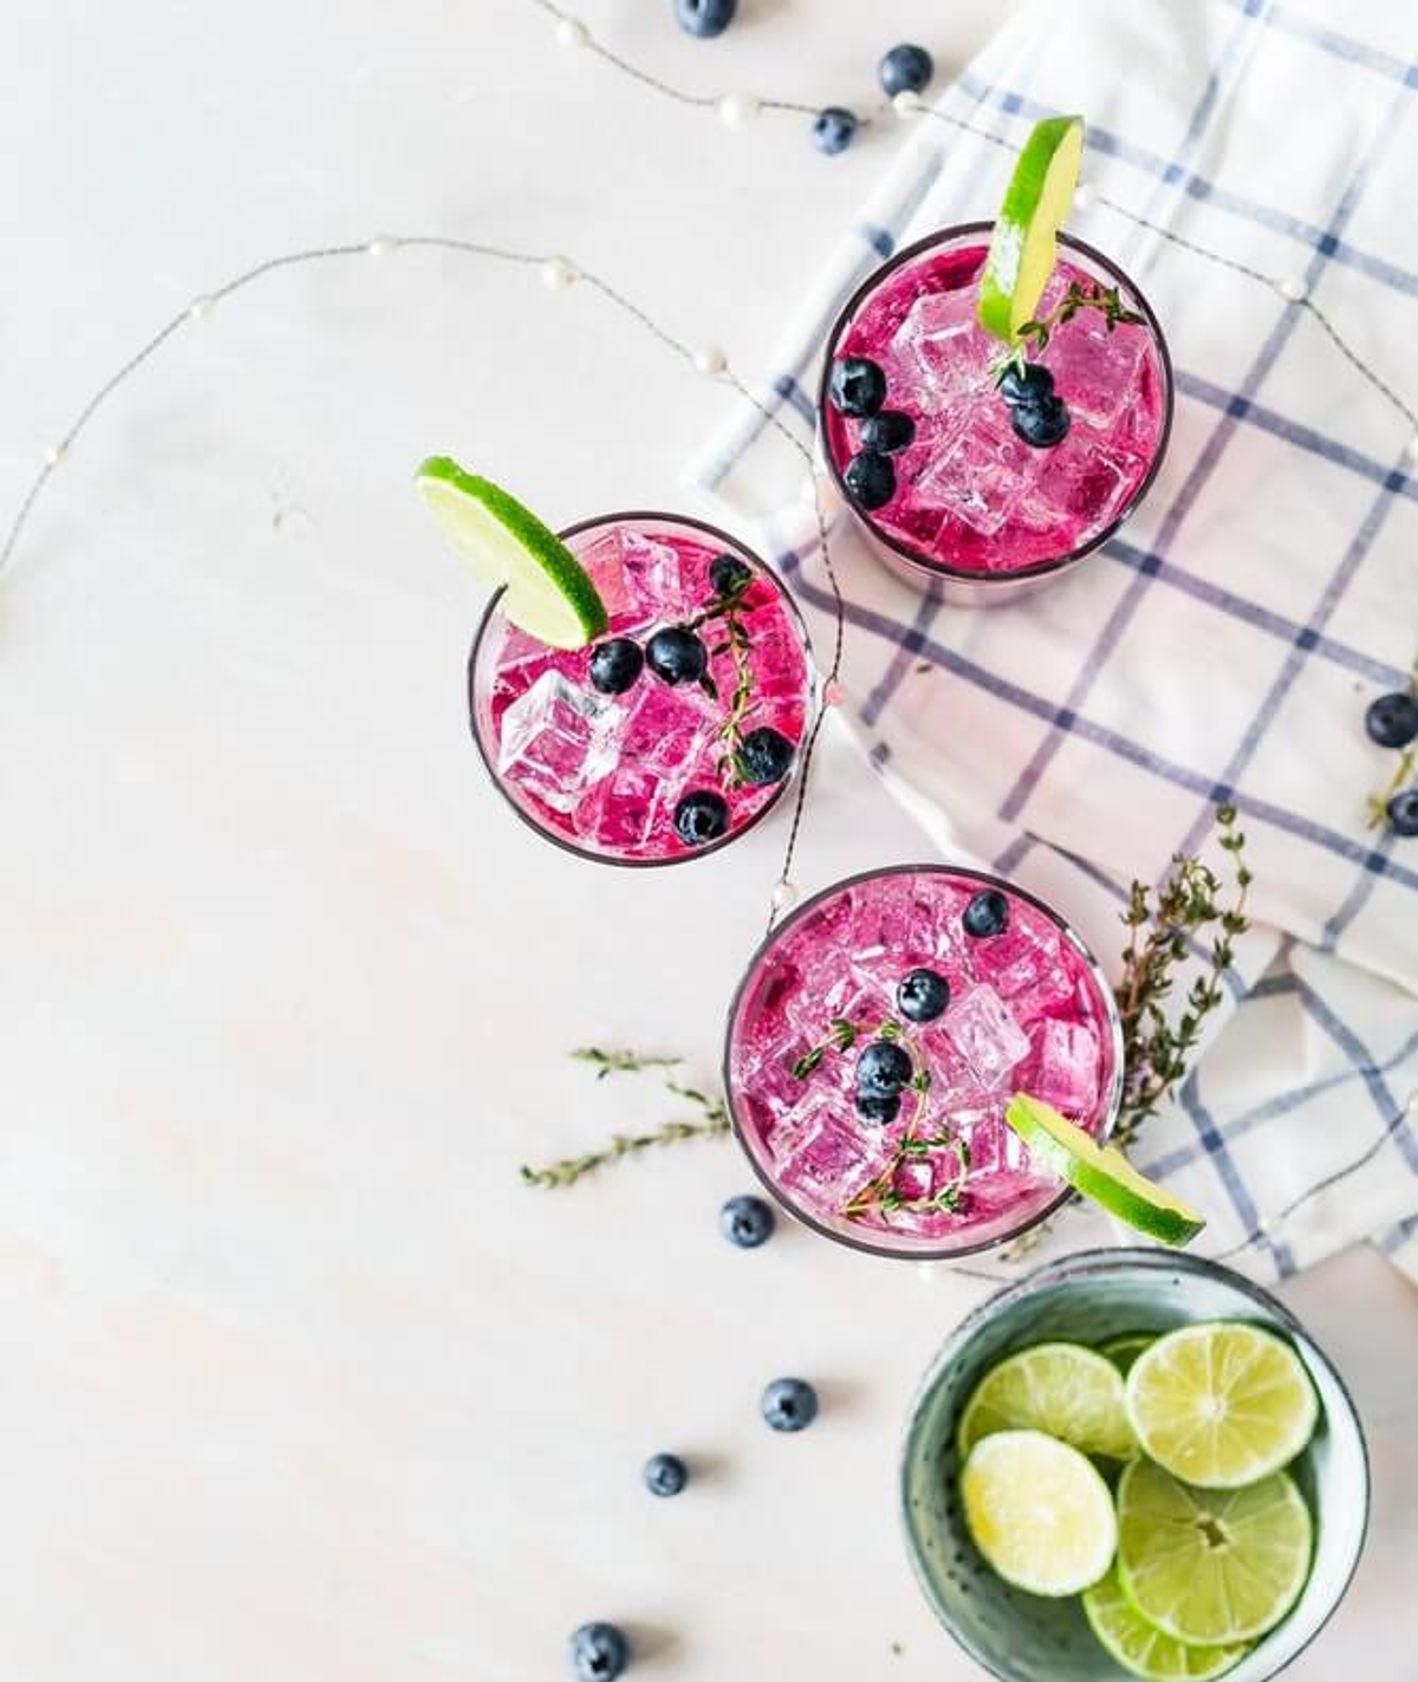 lemoniada z jagodami